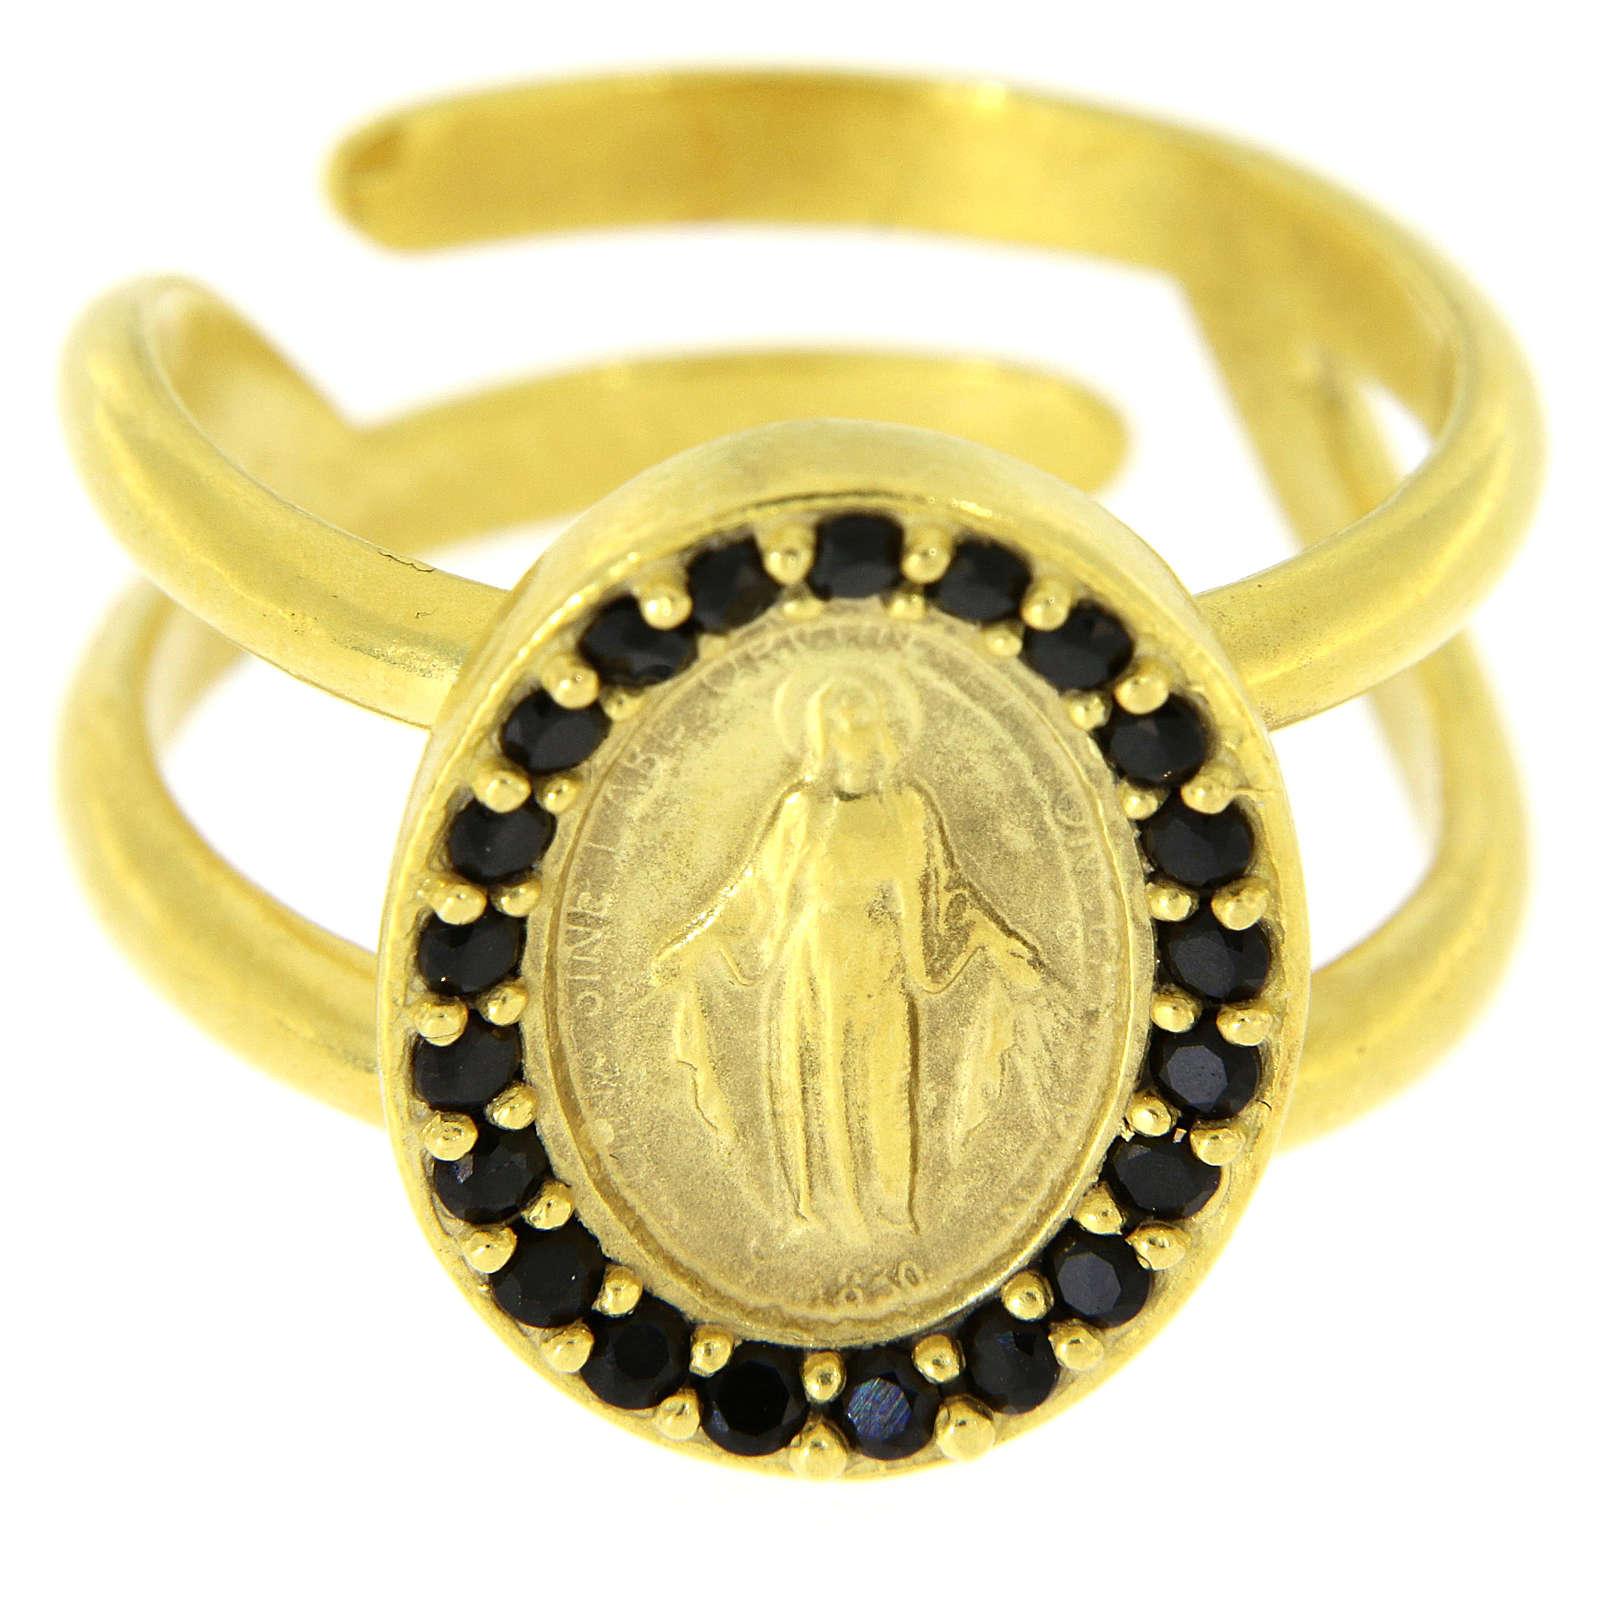 Anillo plata 925 dorado ajustable Medalla Milagrosa 3